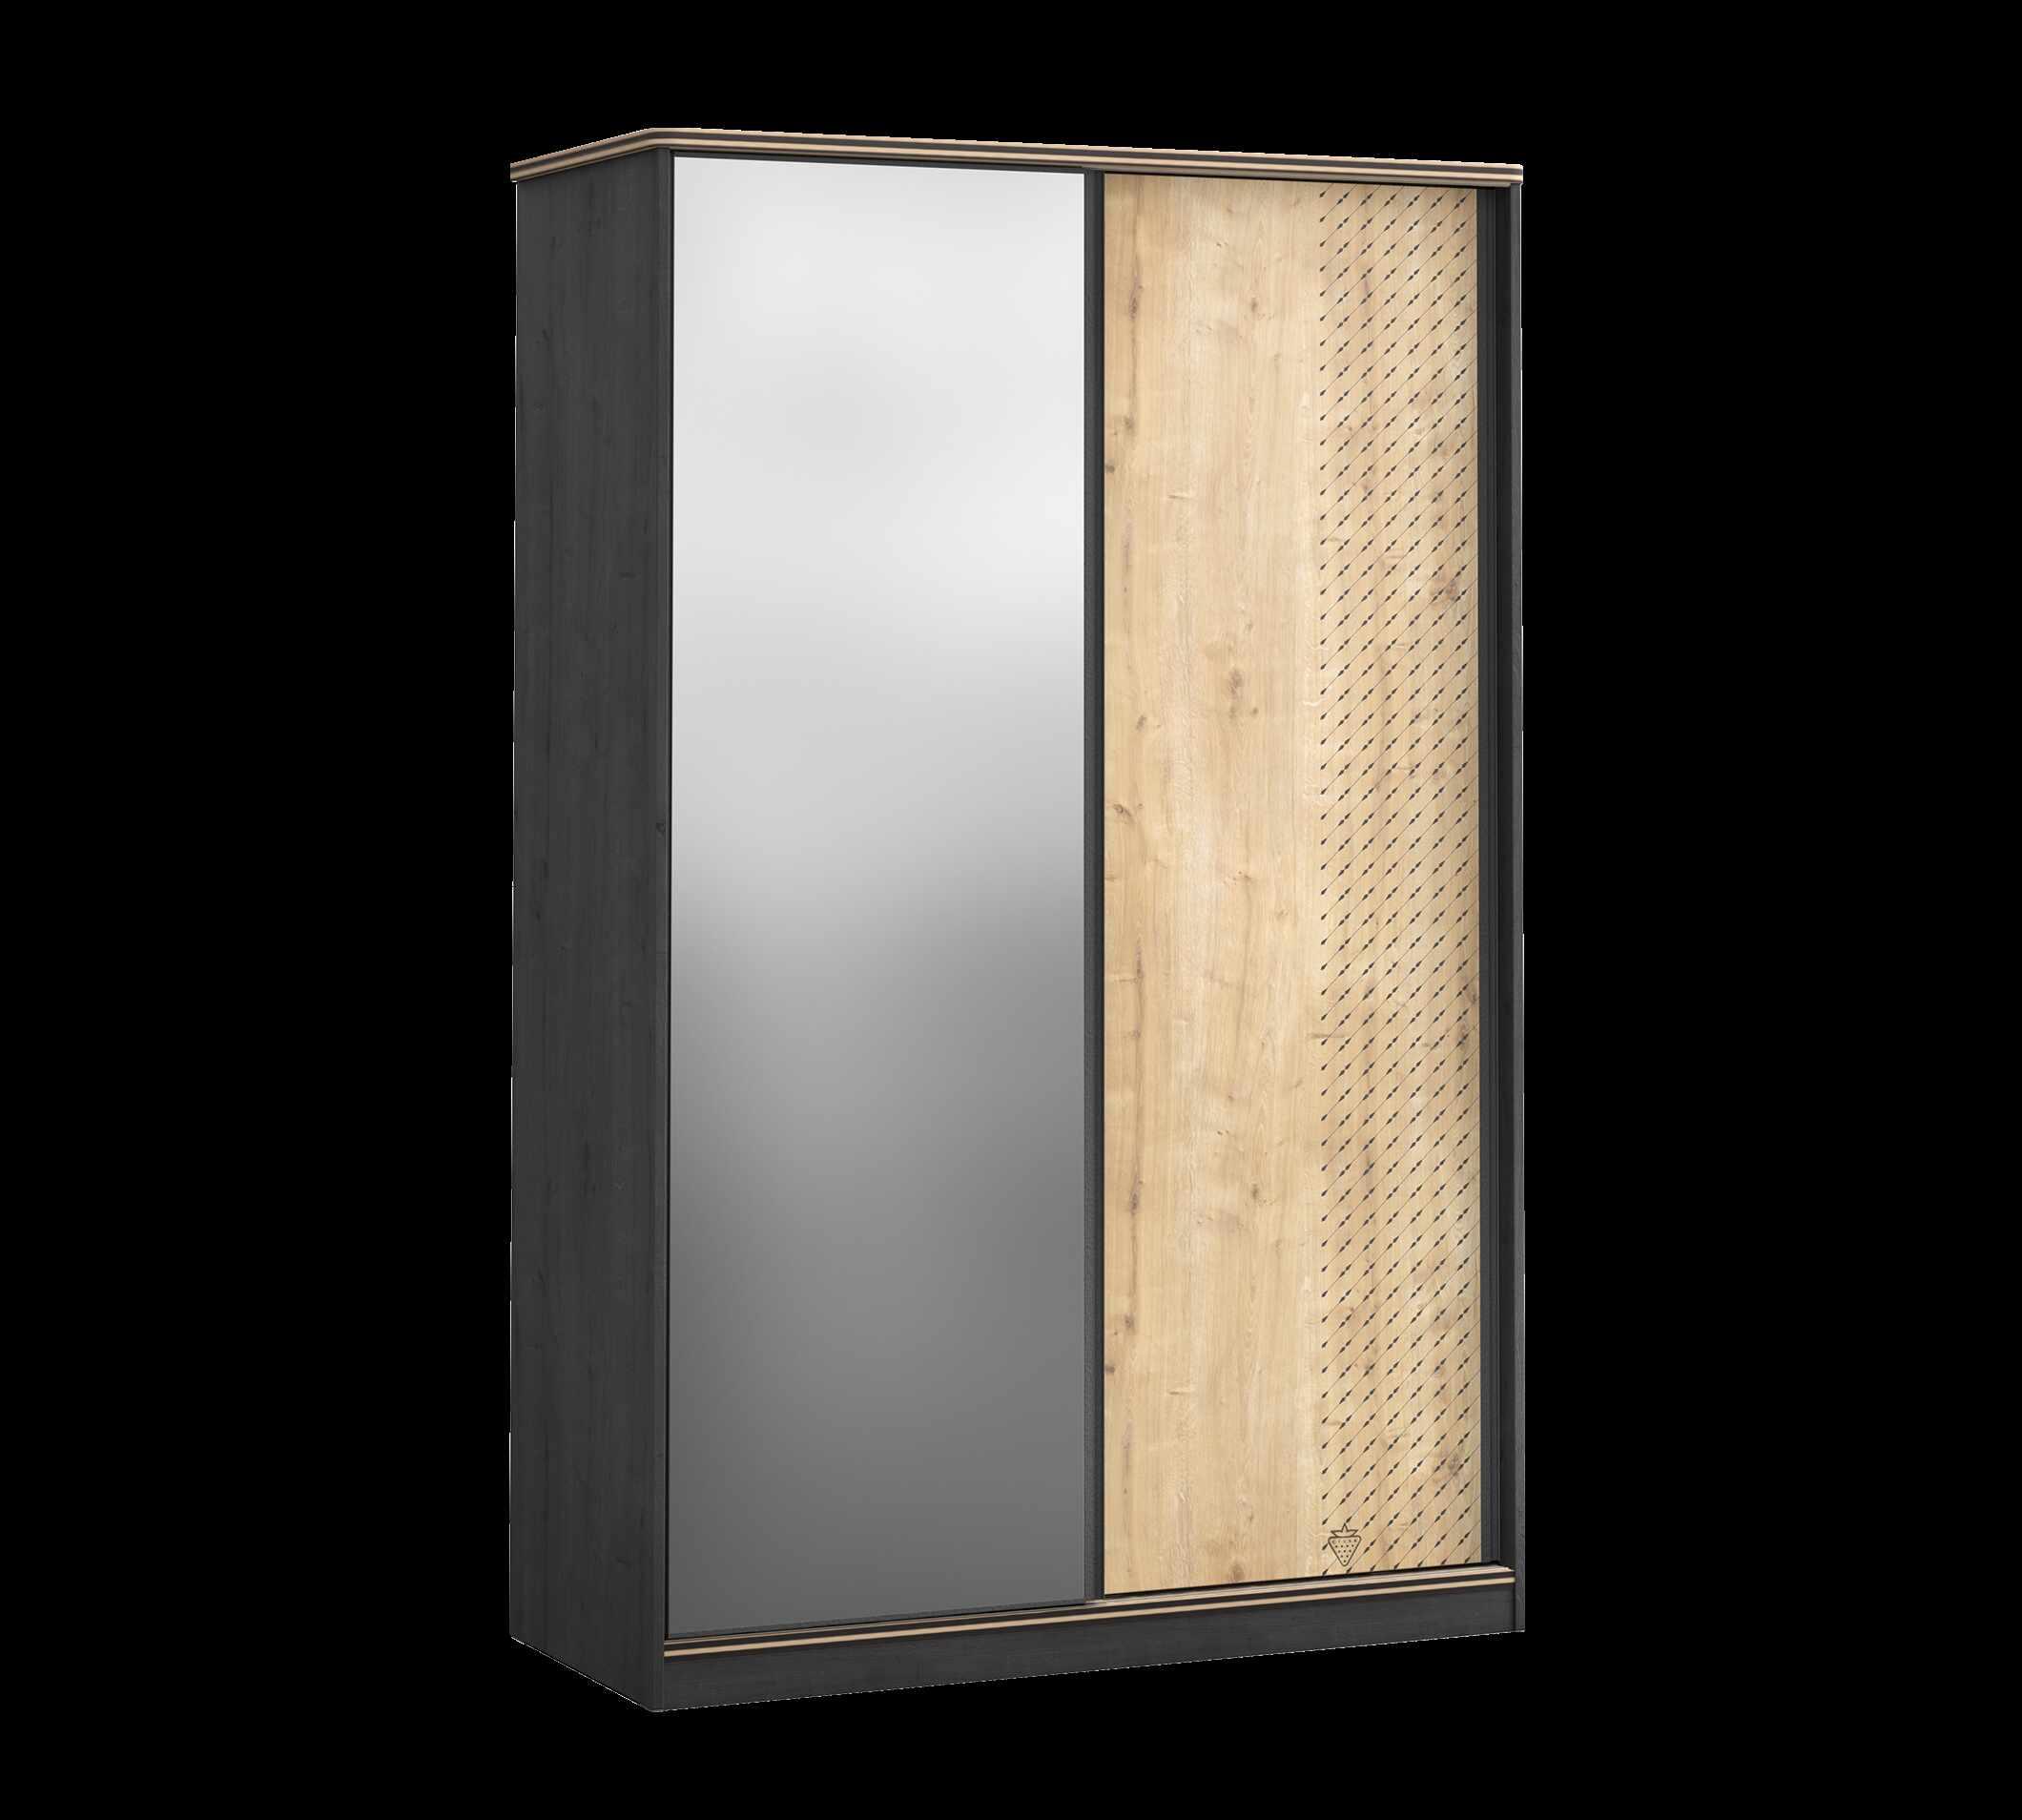 Dulap din pal cu 2 usi glisante si oglinda, pentru tineret Blacky Small Black / Nature, l132xA59xH206 cm la pret 3470 lei